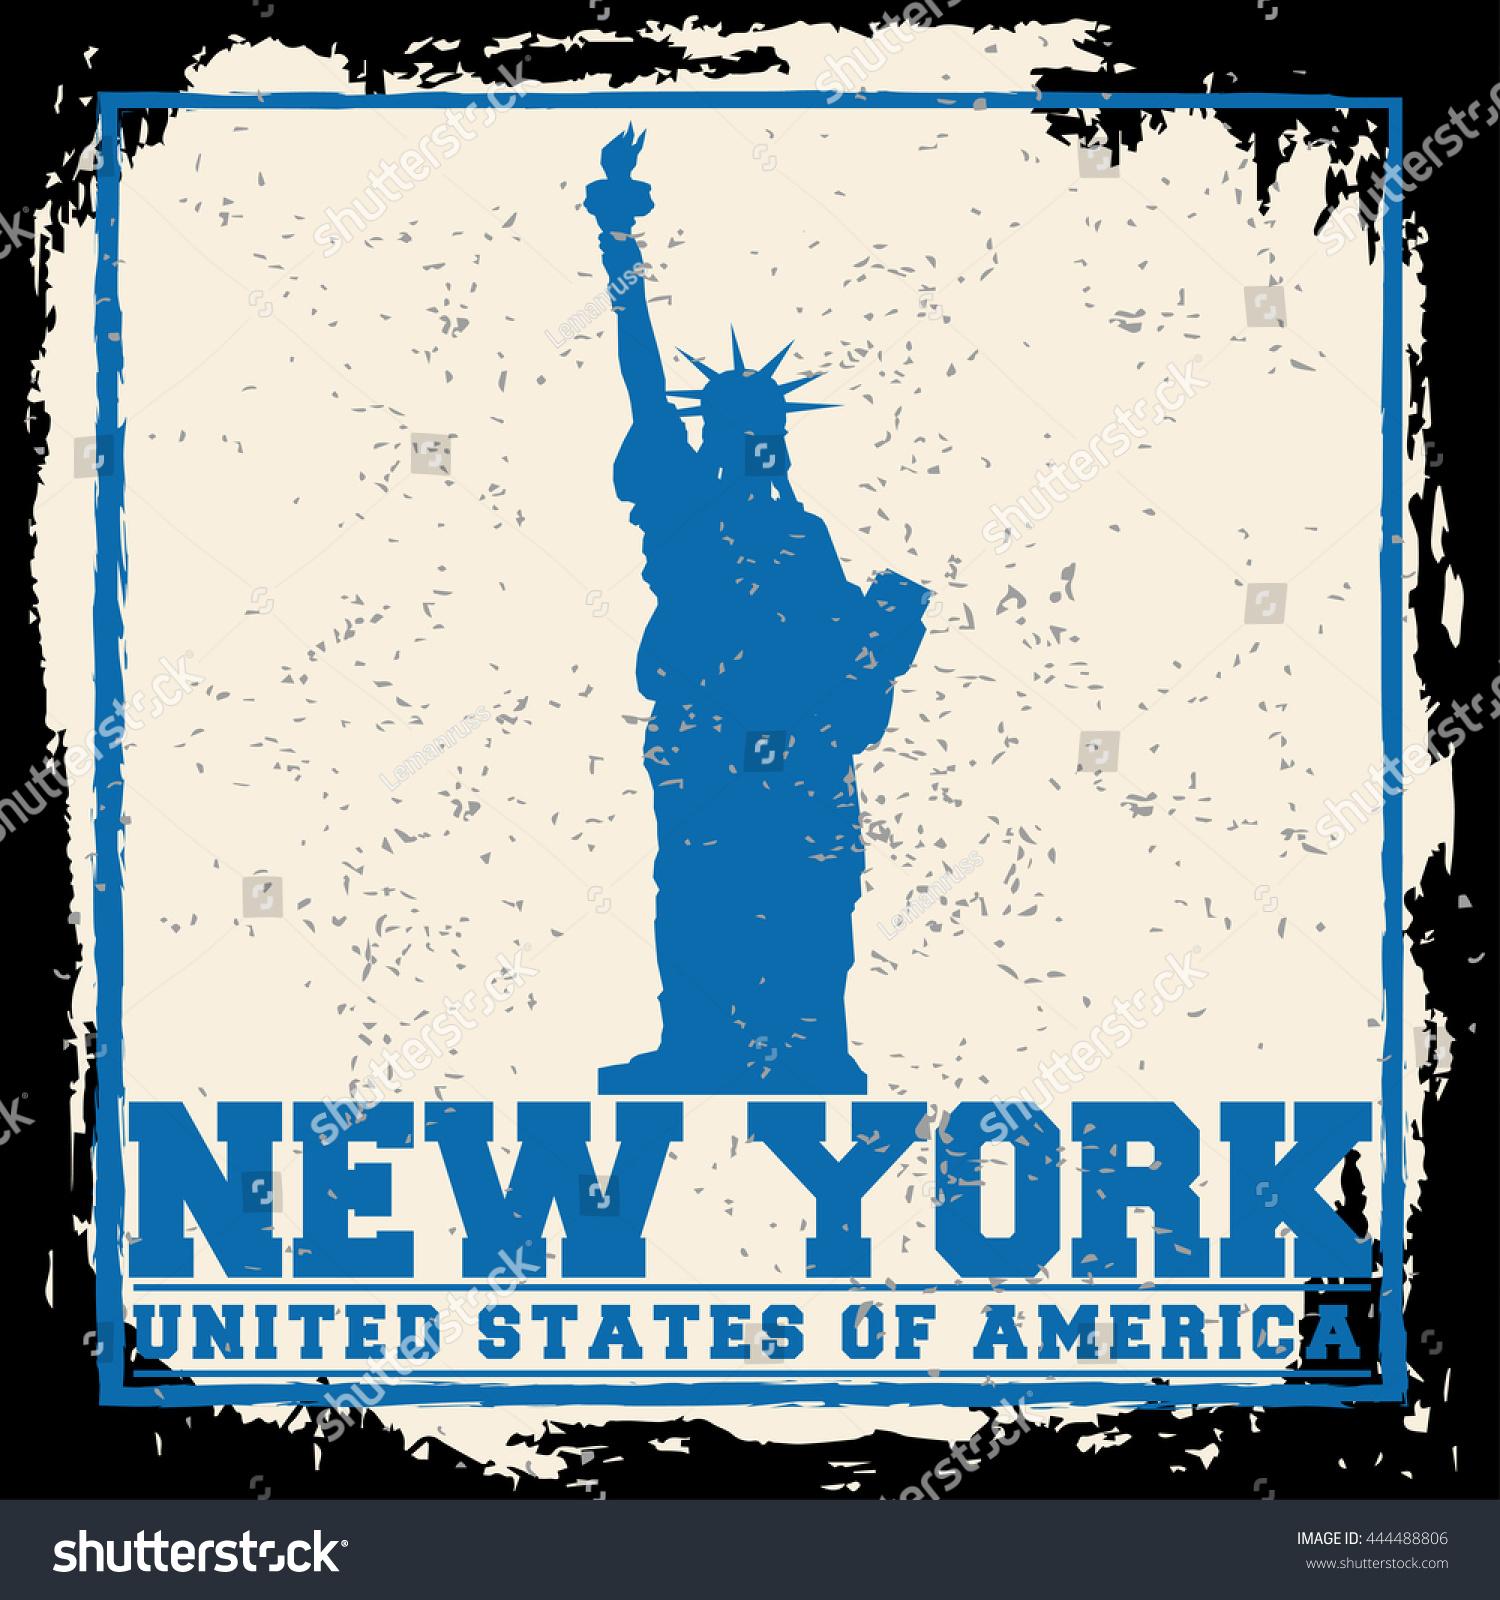 Poster design nyc - New York City Concept Logo Label T Shirt Design Nyc